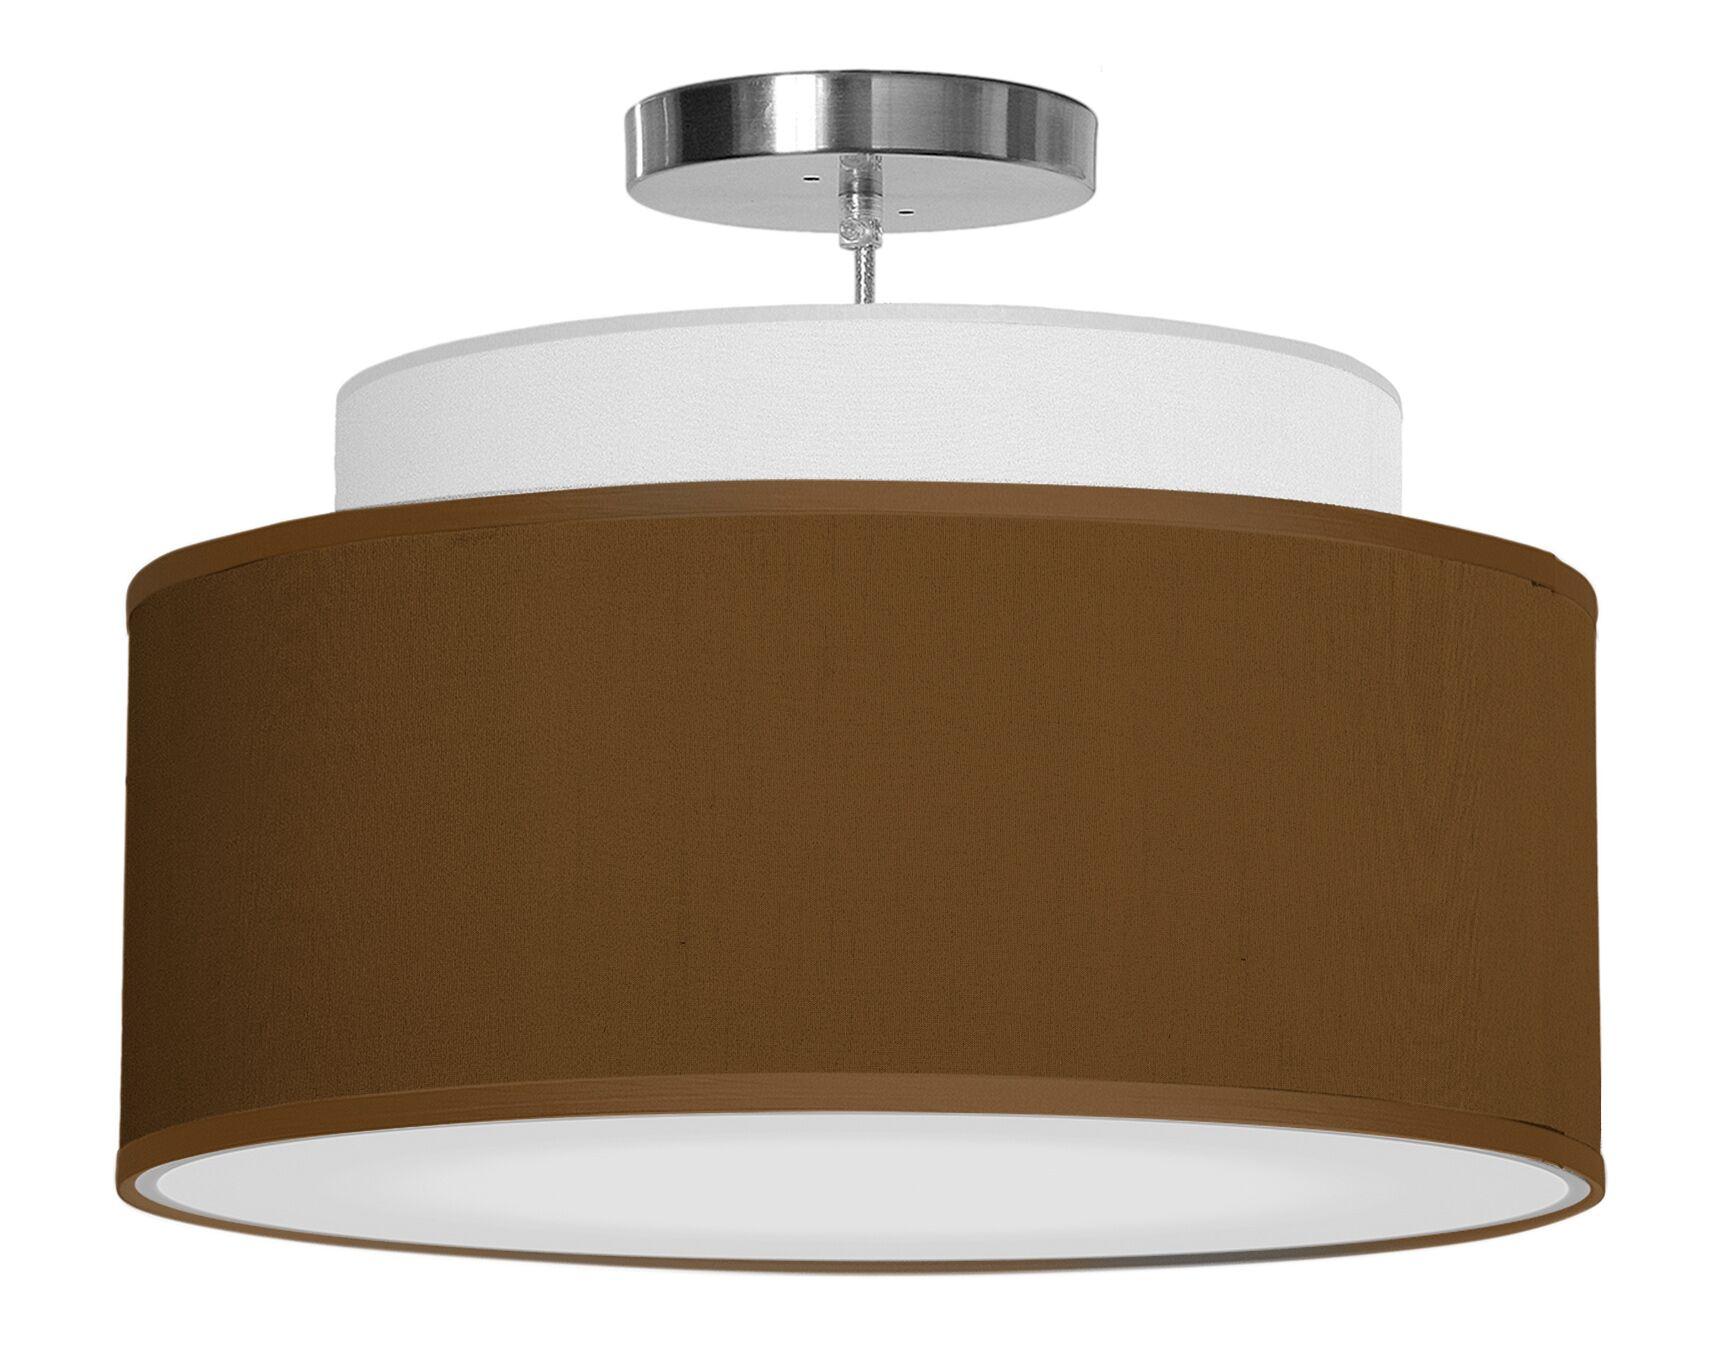 Abba 1-Light Pendant Shade Color: Antique Copper, Size: 12